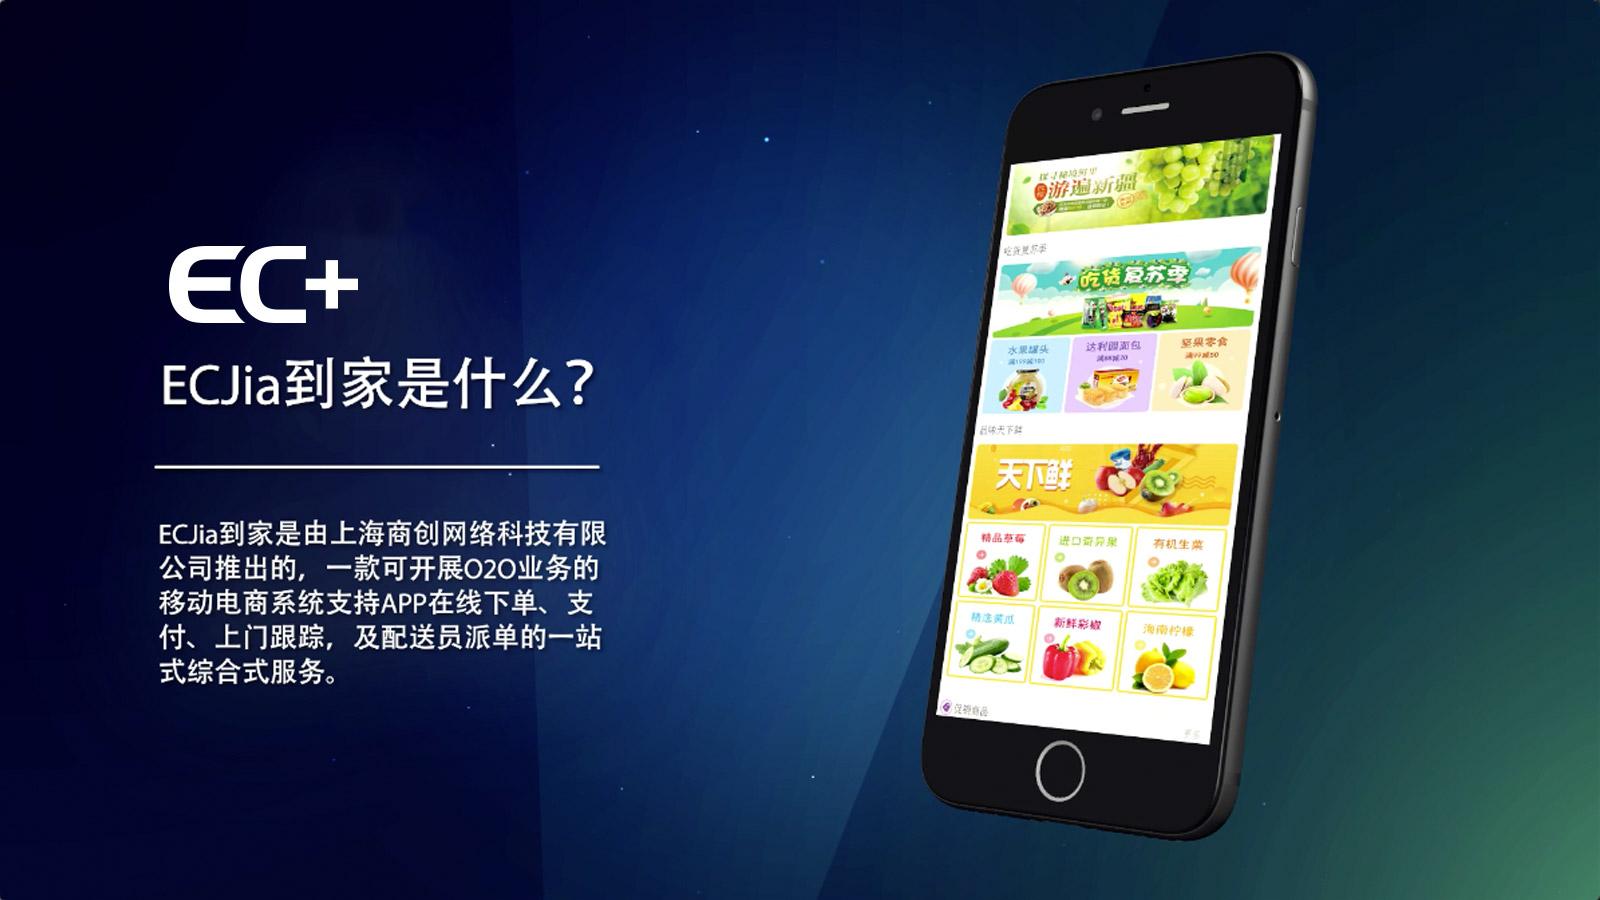 ECJia到家 app